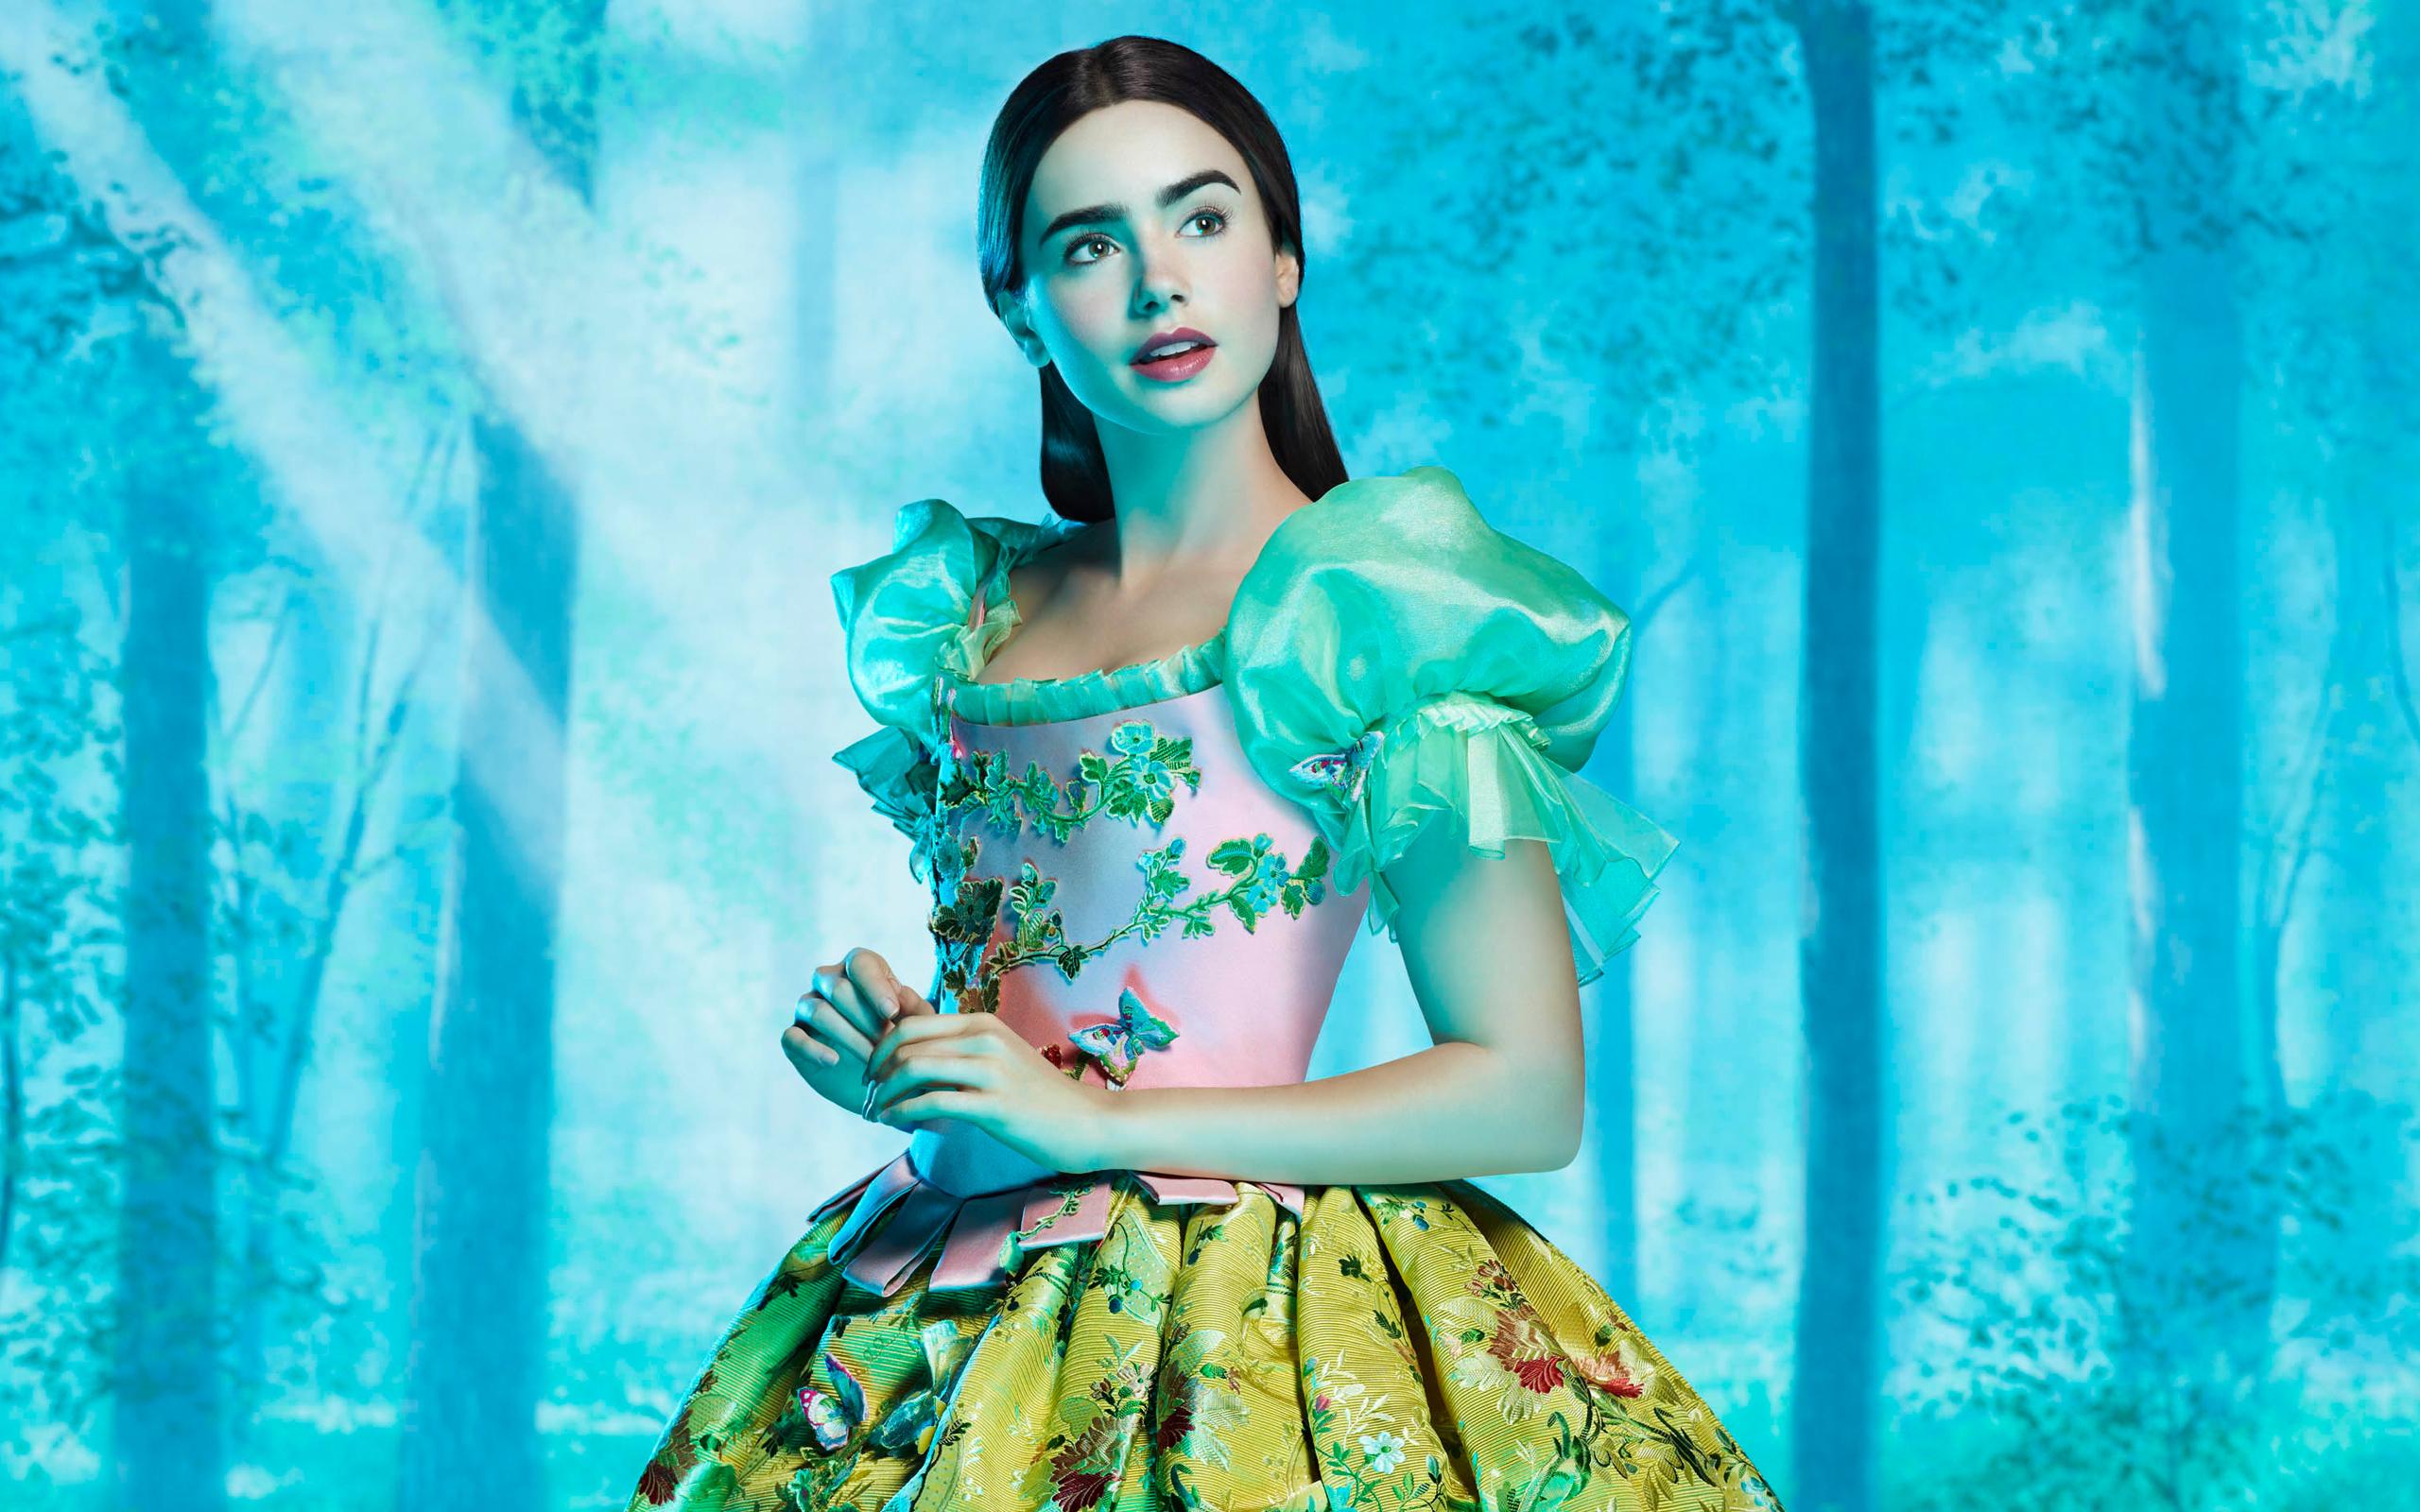 Lily Collins as Snow White wallpaper